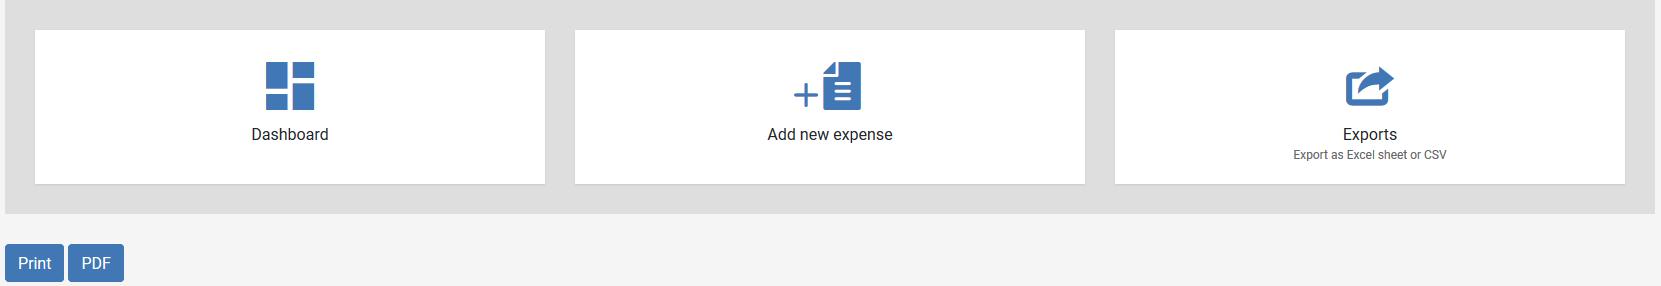 Expenses menu